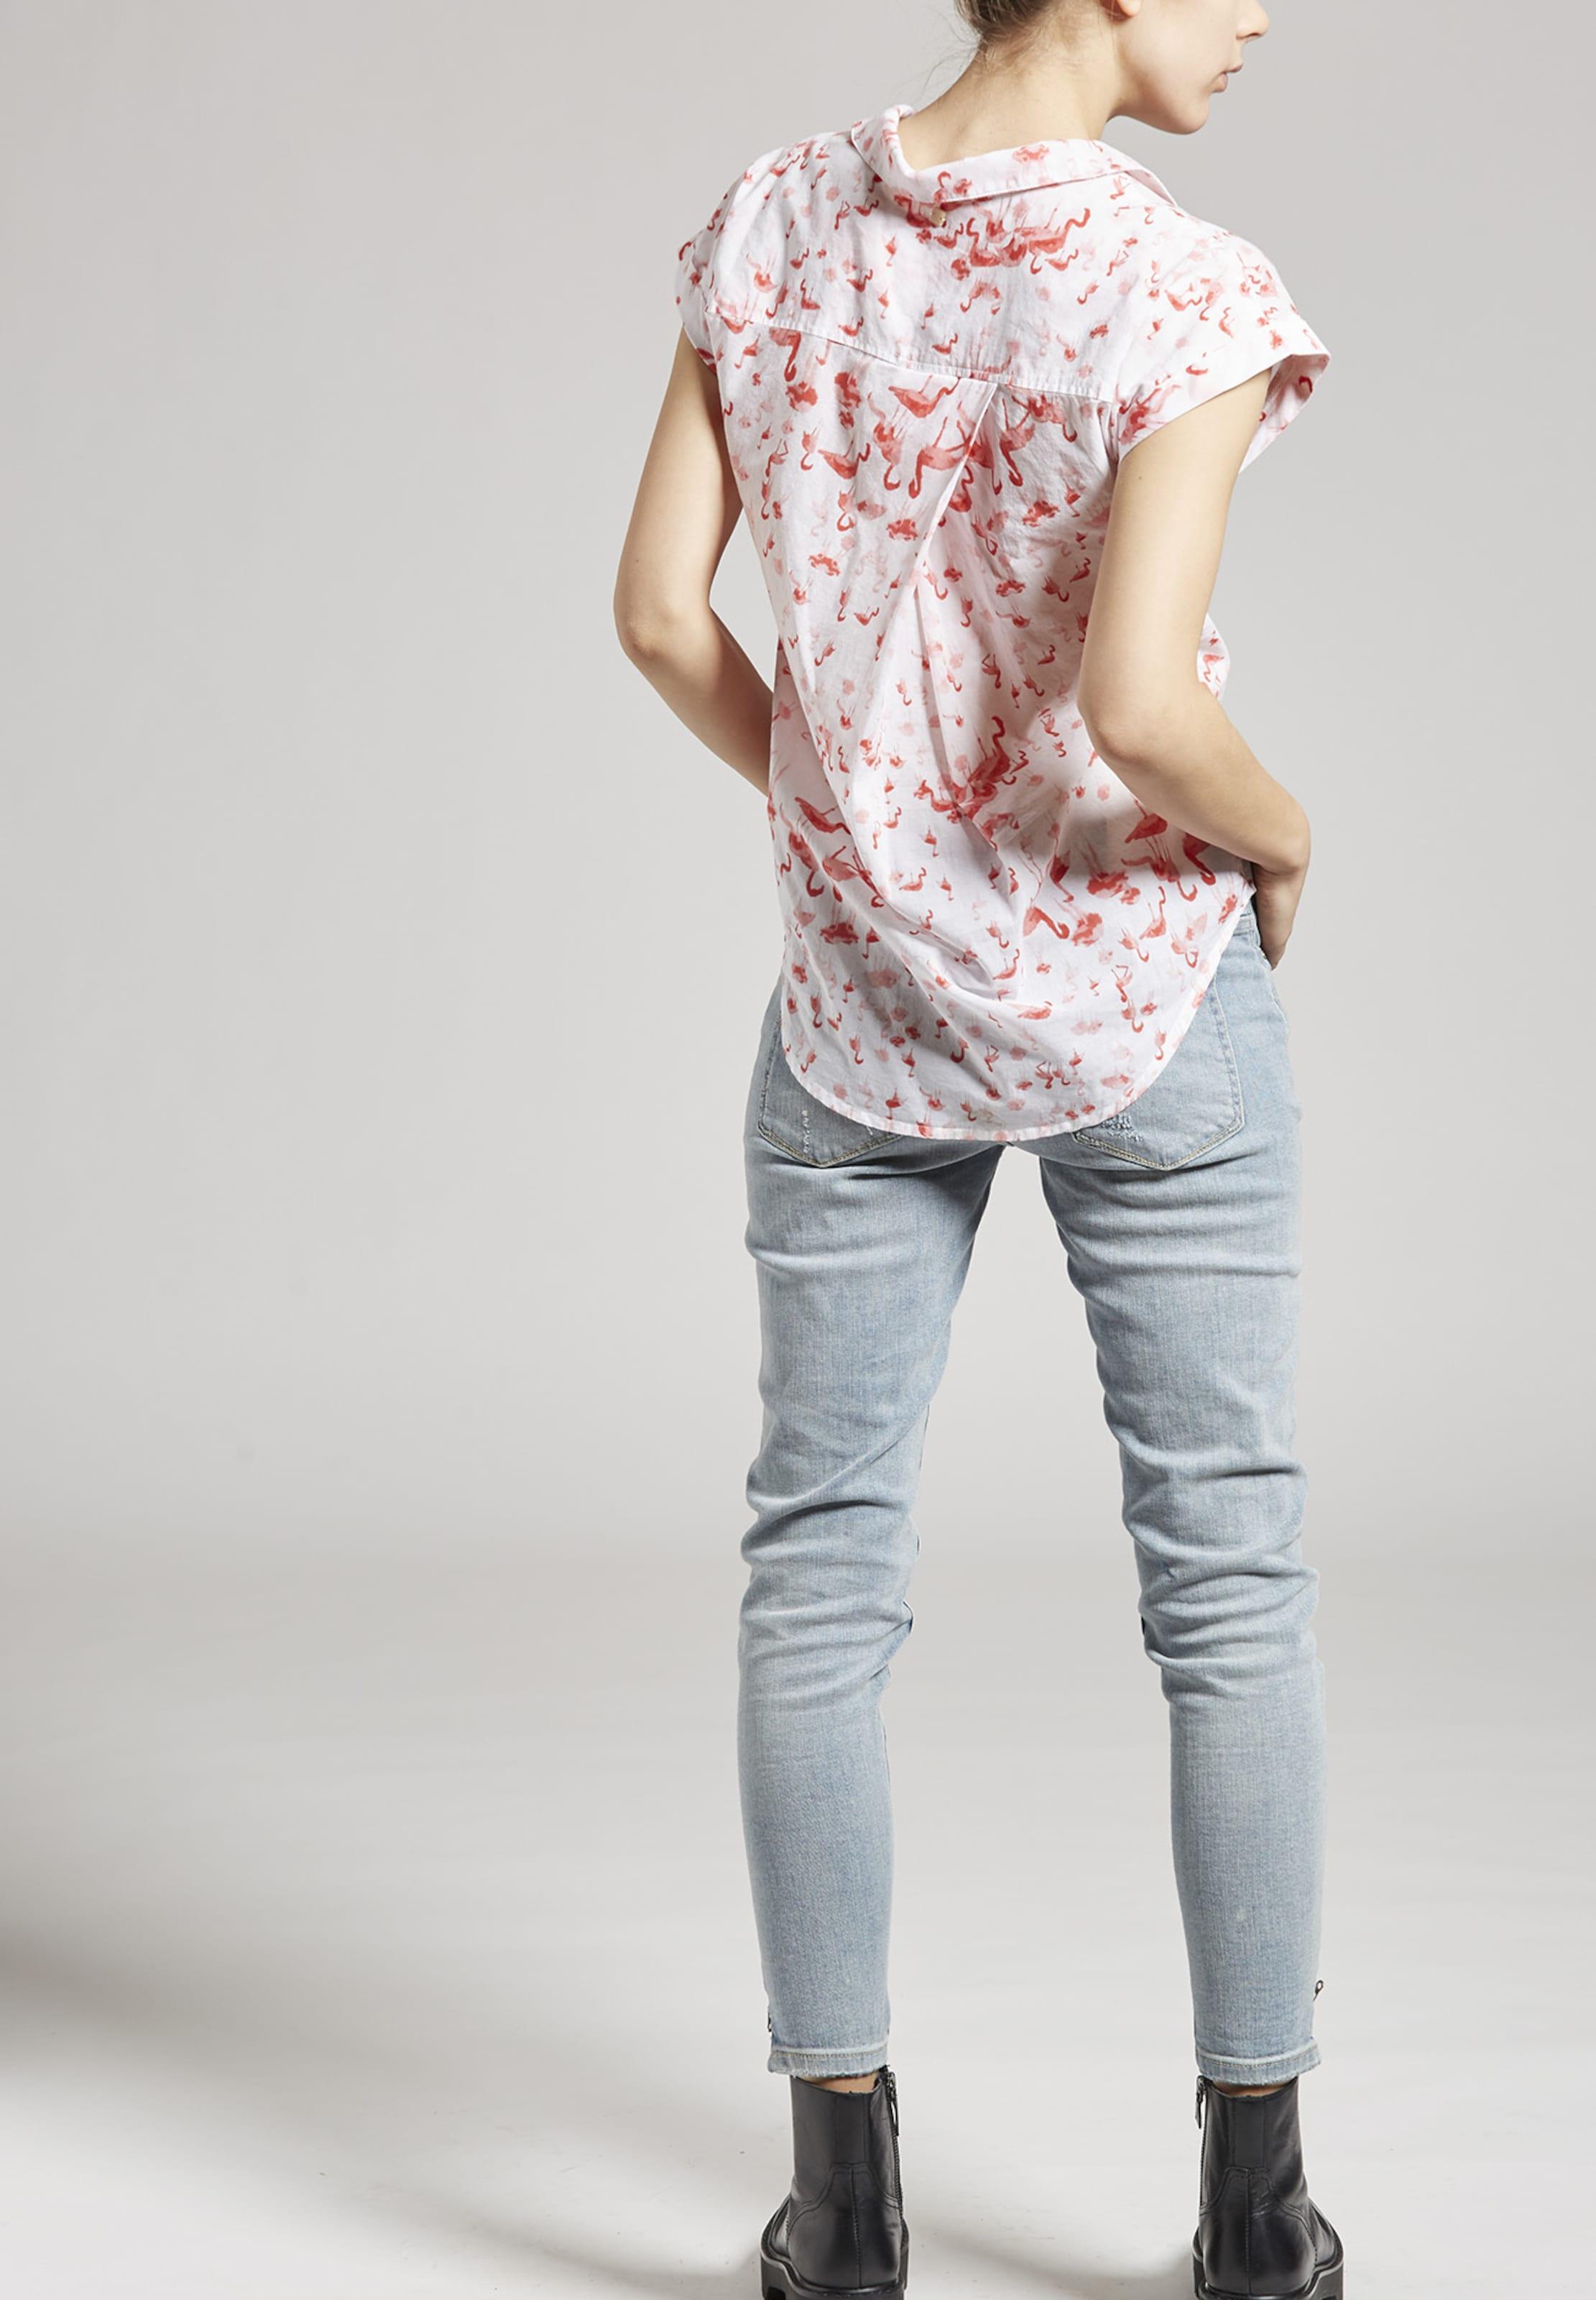 Shirt 'odette' Khujo Khujo Shirt LachsWeiß In In 'odette' pSVzqUM